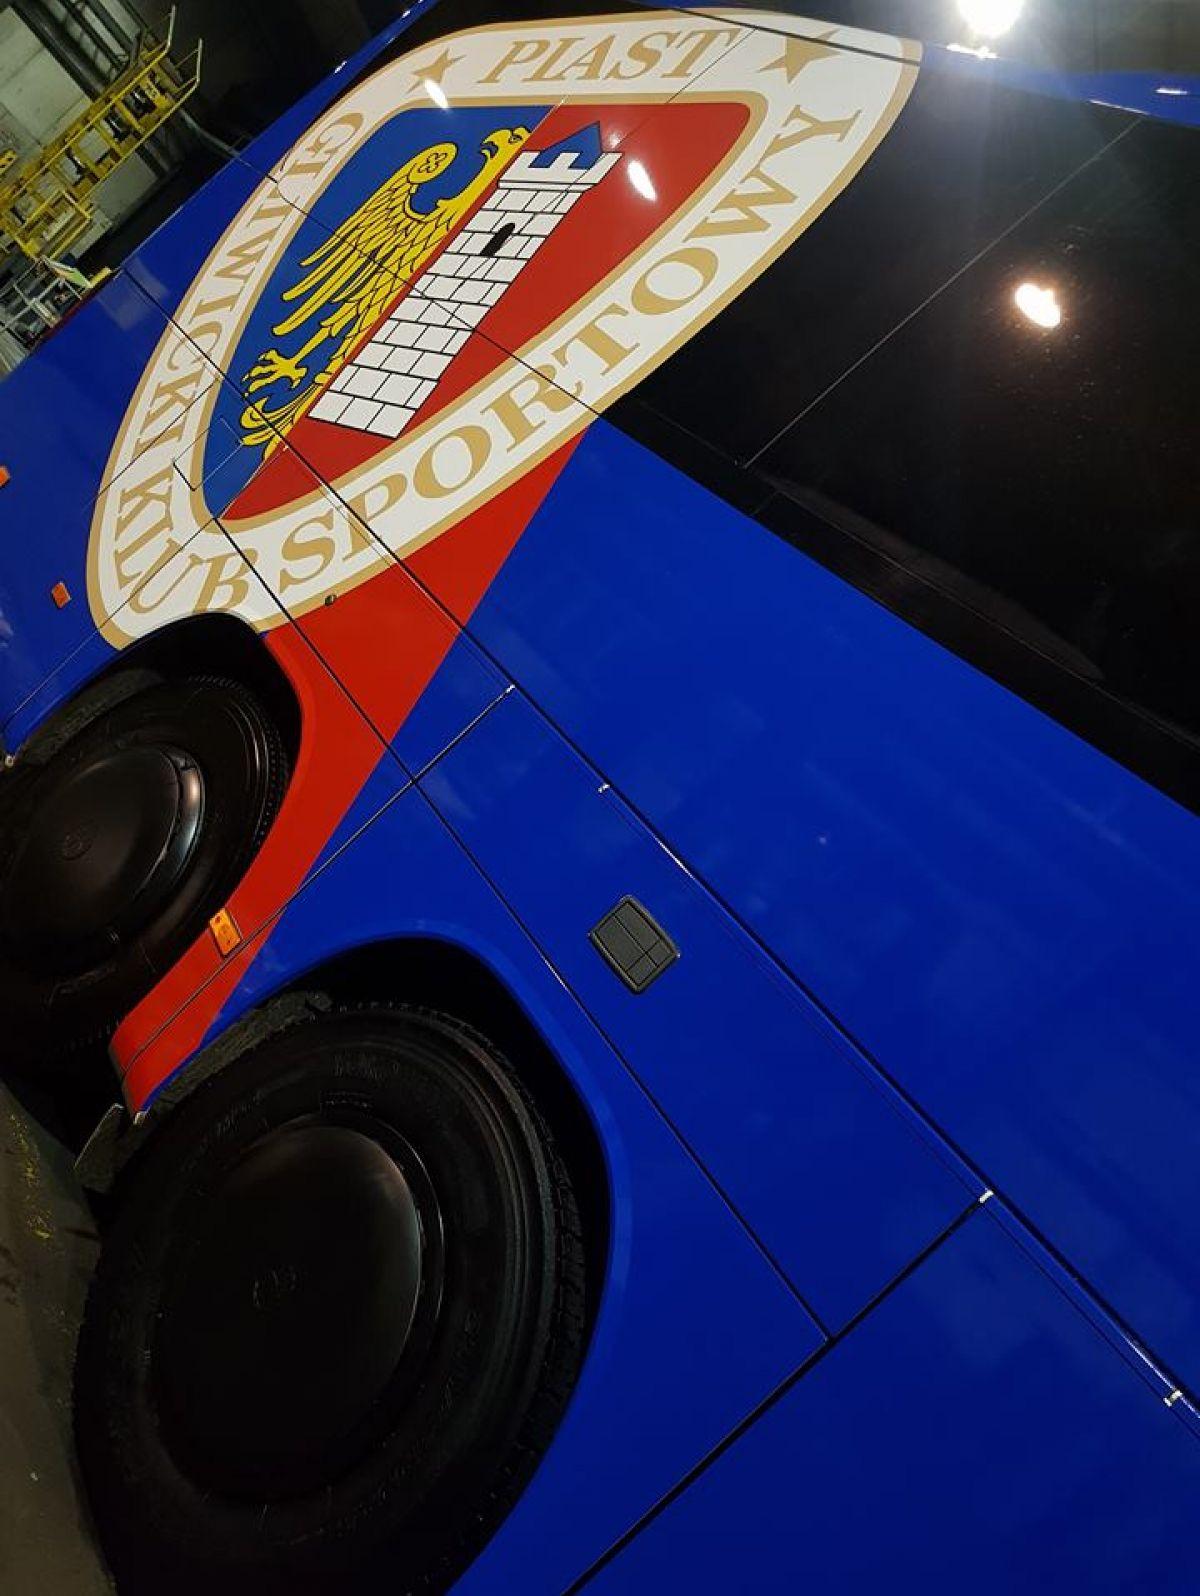 Autobus Piasta Gliwice